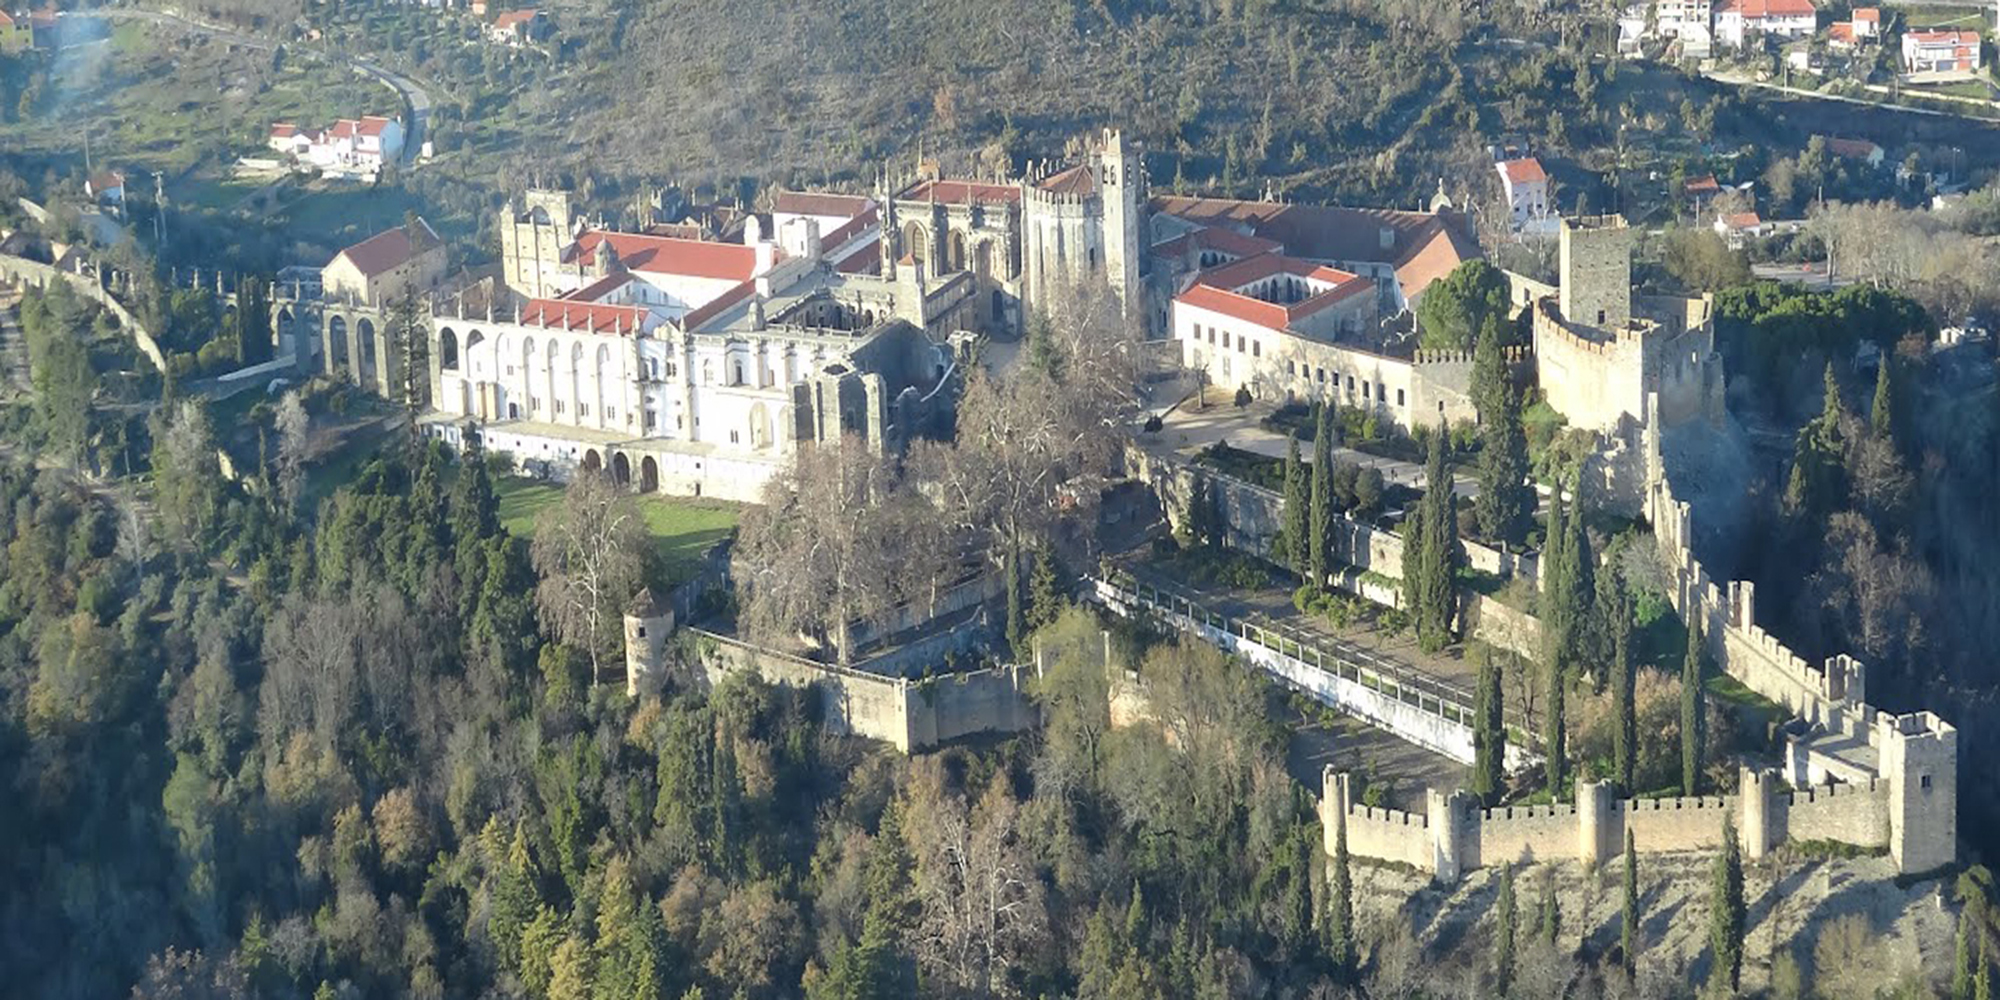 Christusritterburg - Convento da Ordem de Cristo